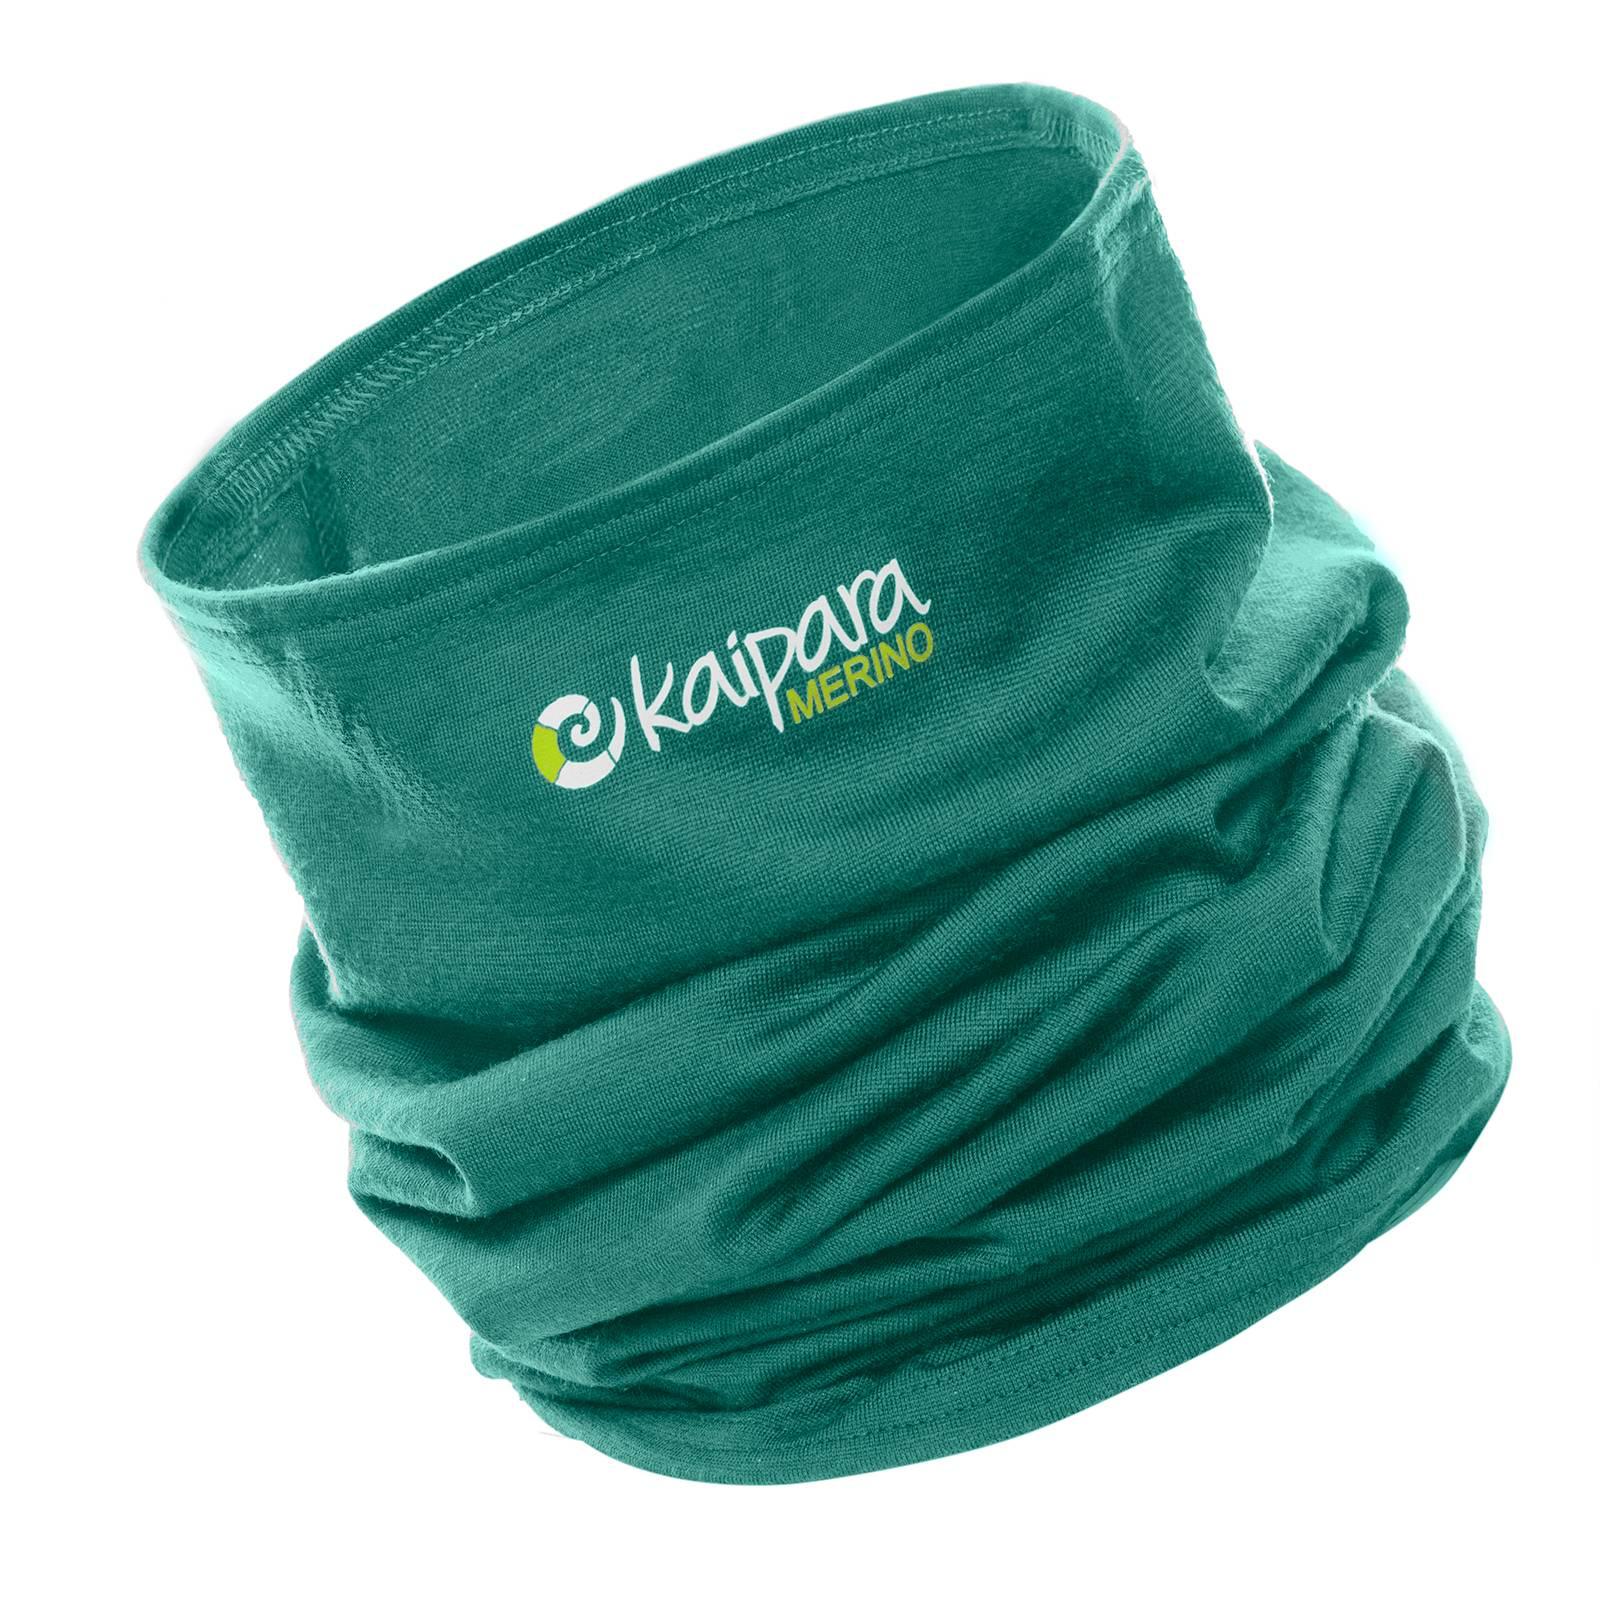 Merino Schal Unisex 200 Smaragd Onesize